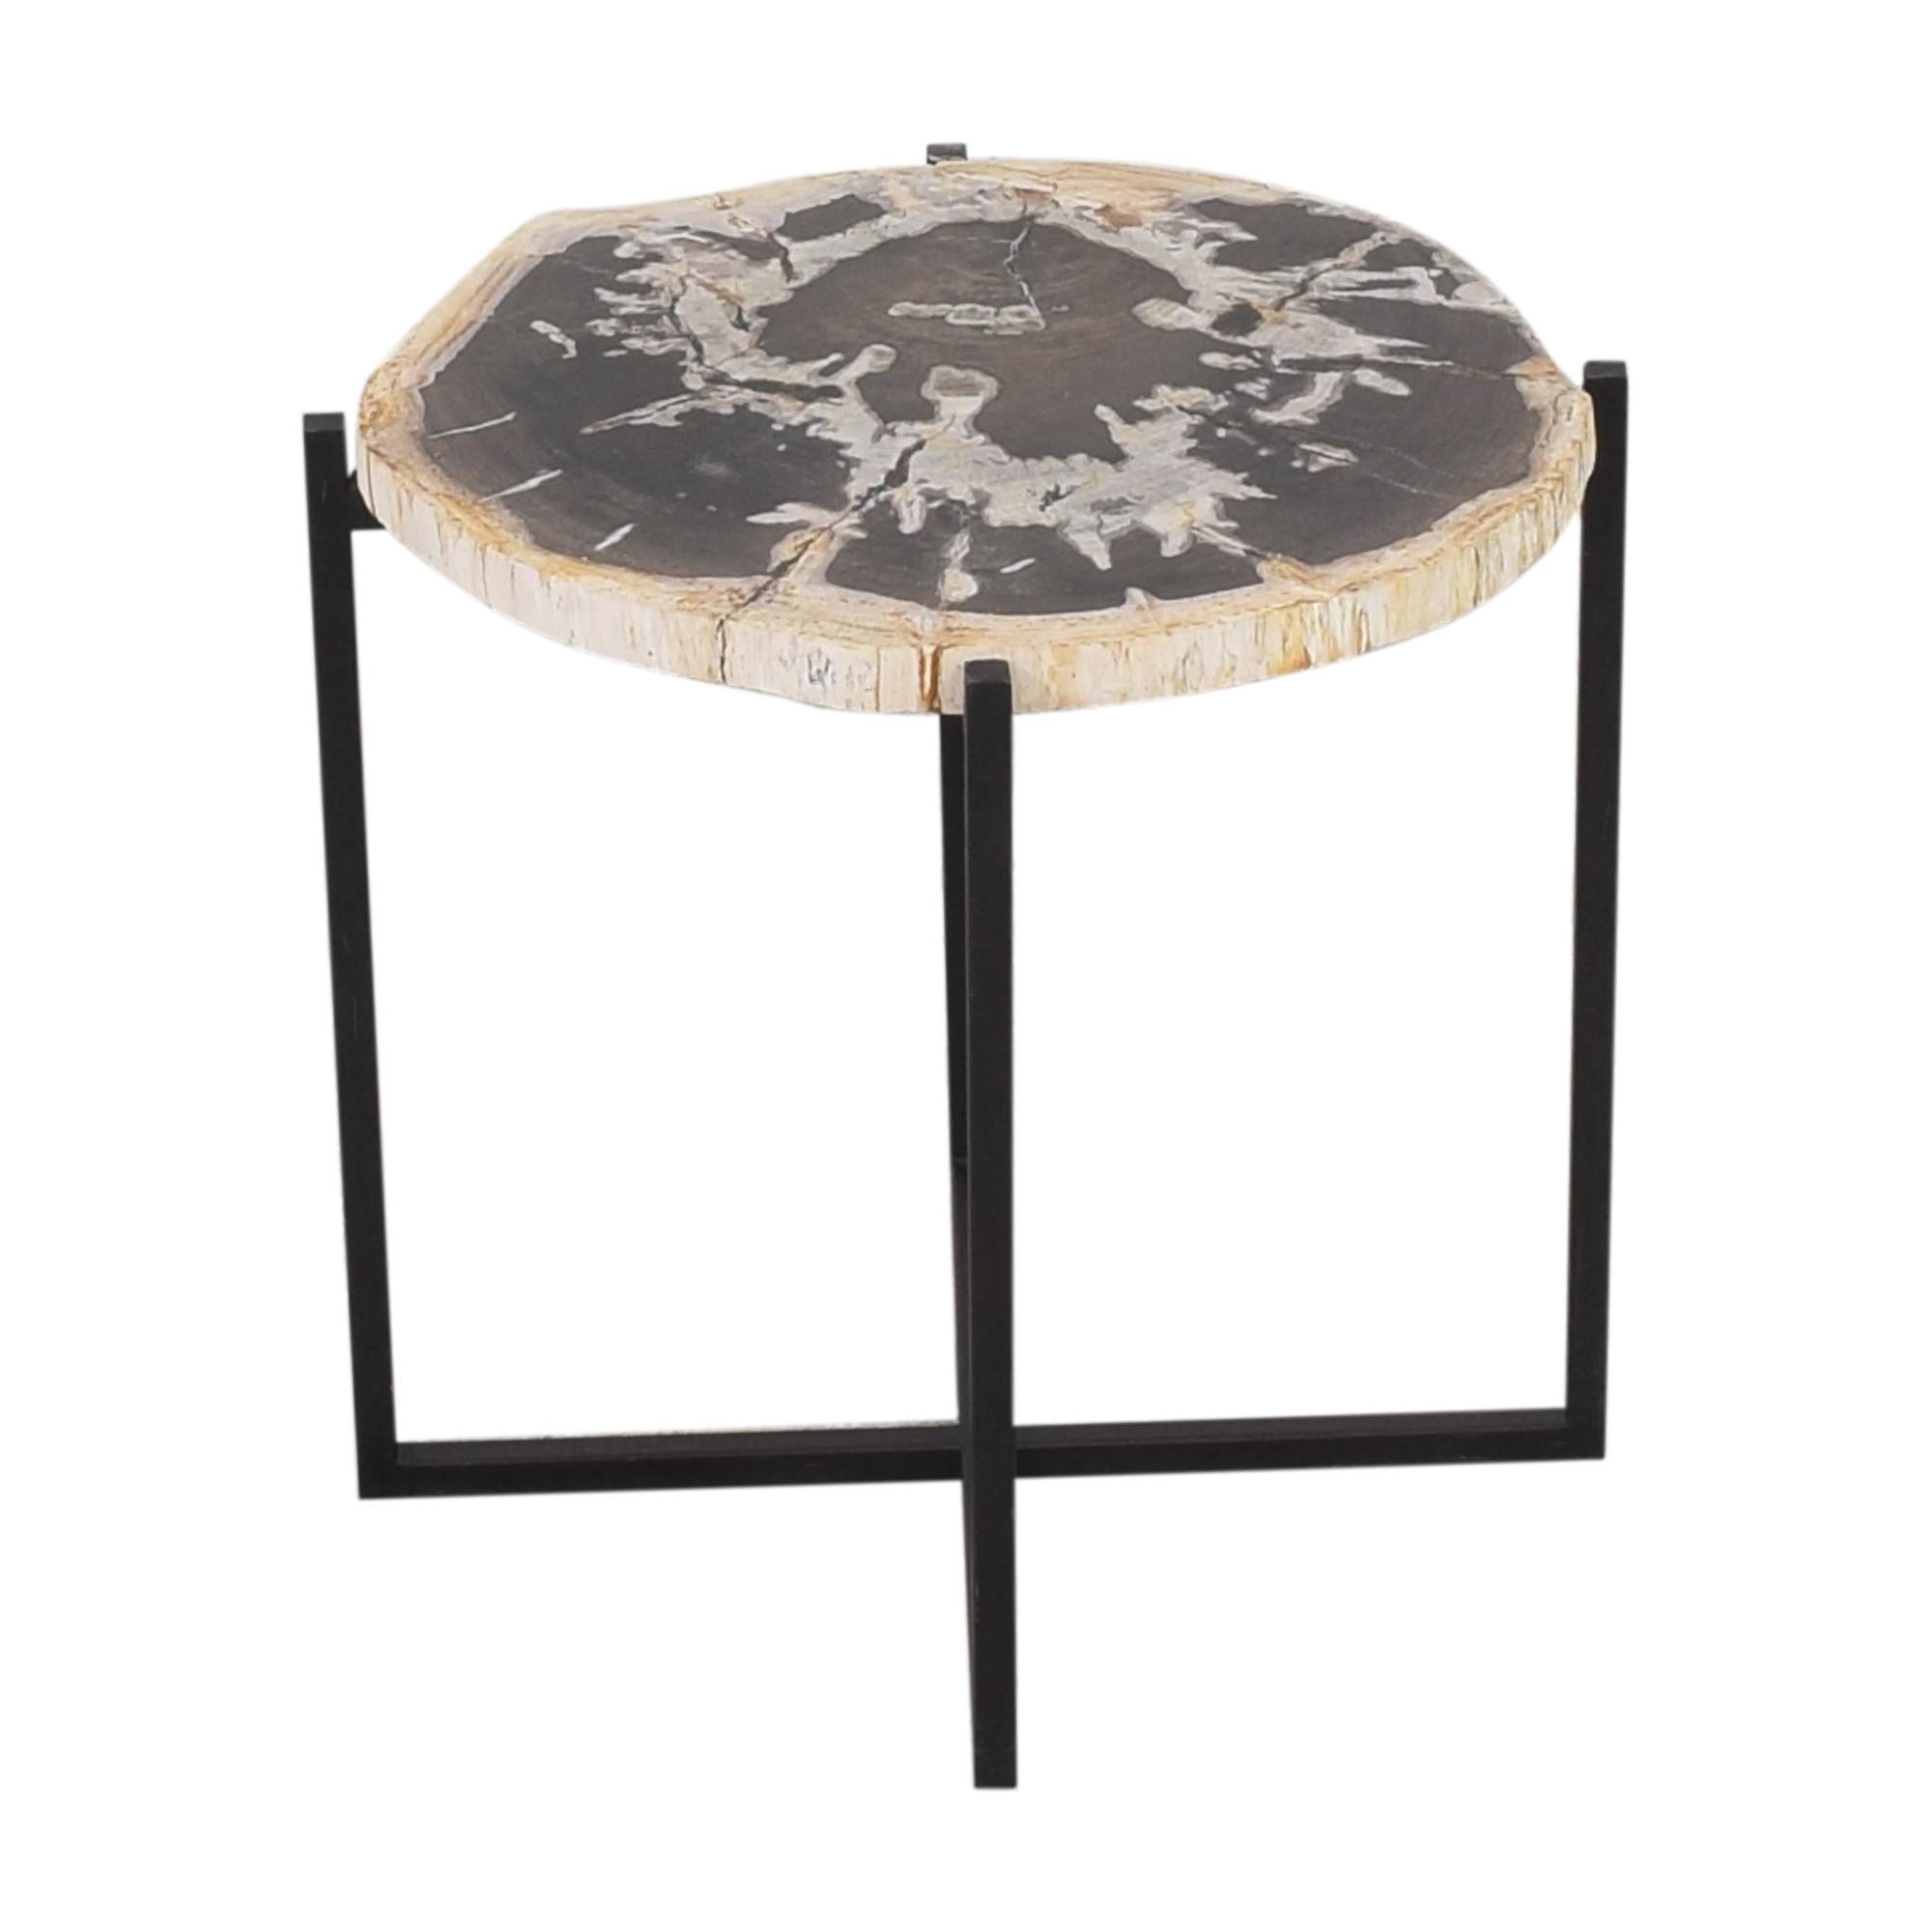 West Elm West Elm Petrified Side Table on sale